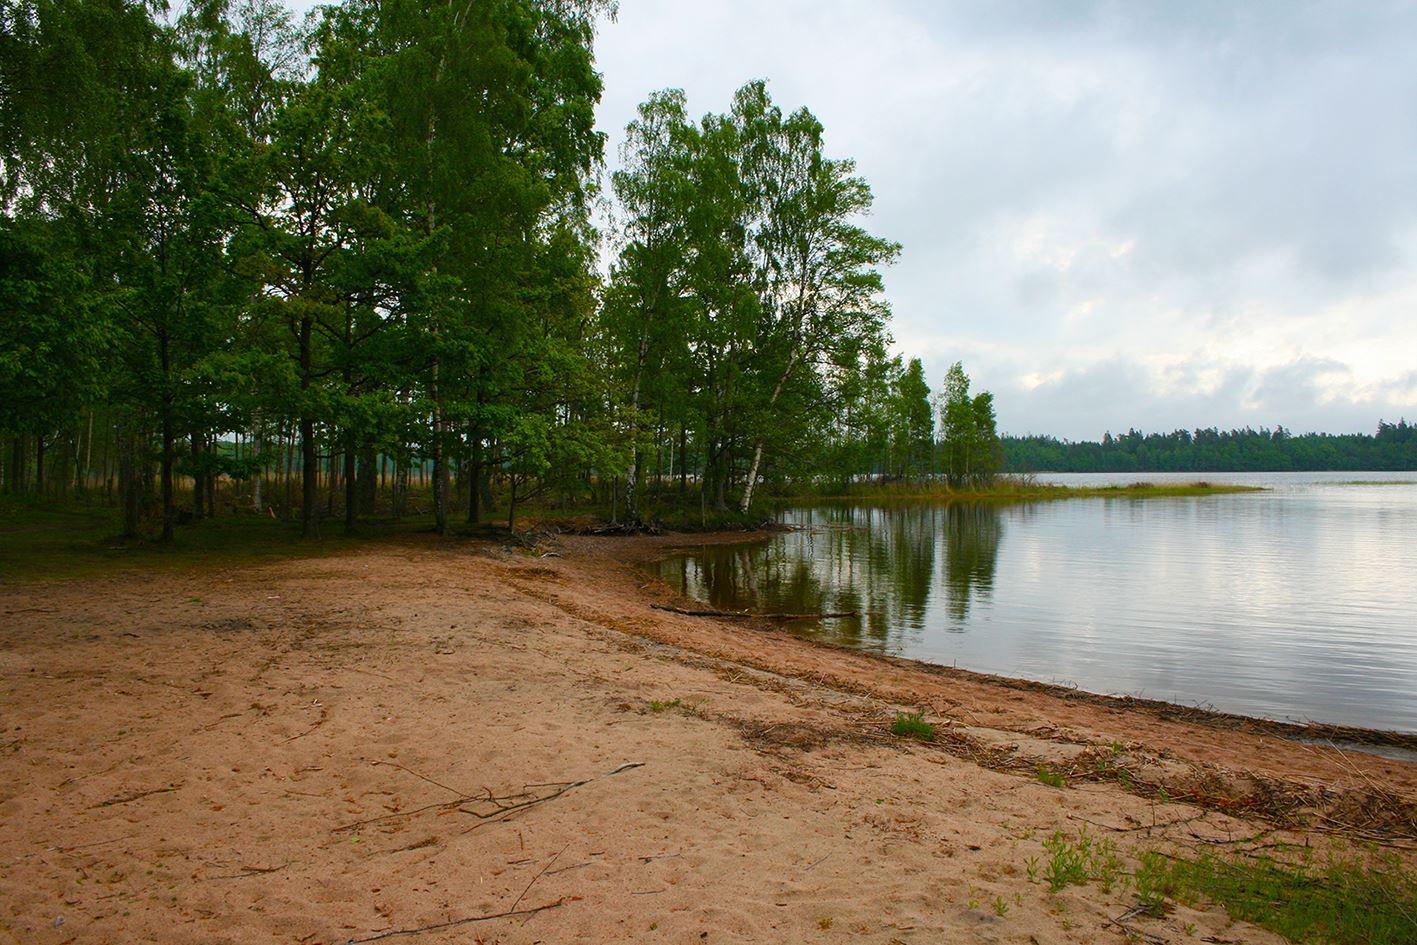 Bathing place Tannåker